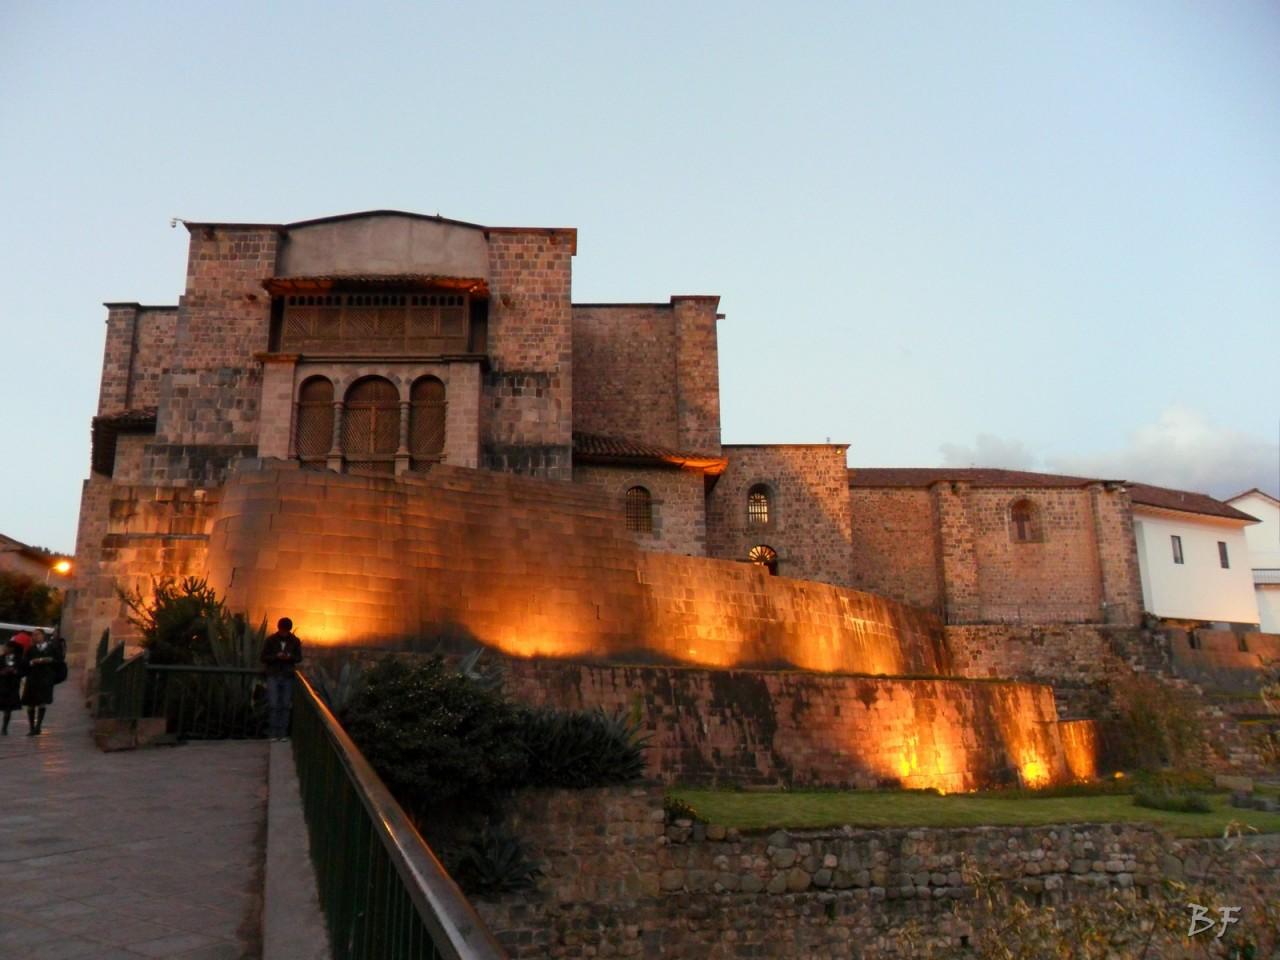 1_Mura-Poligonali-Megaliti-Tempio-Coricancha-Cusco-Perù-13